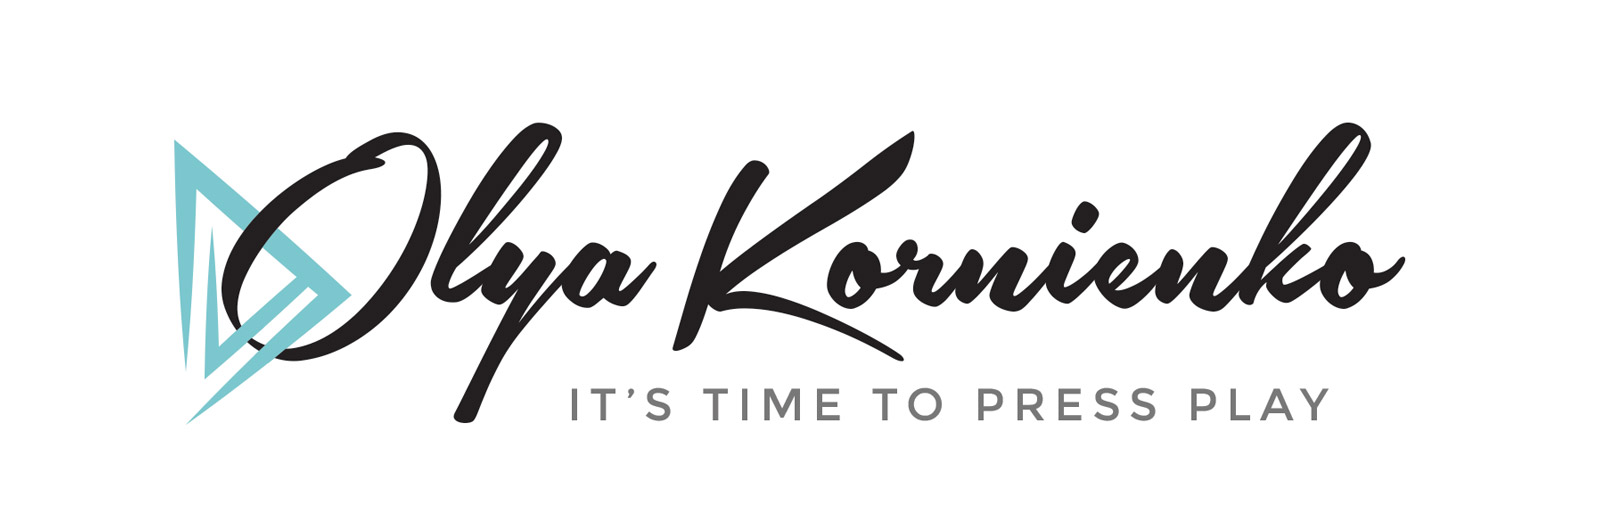 Olya Kornienko logo design